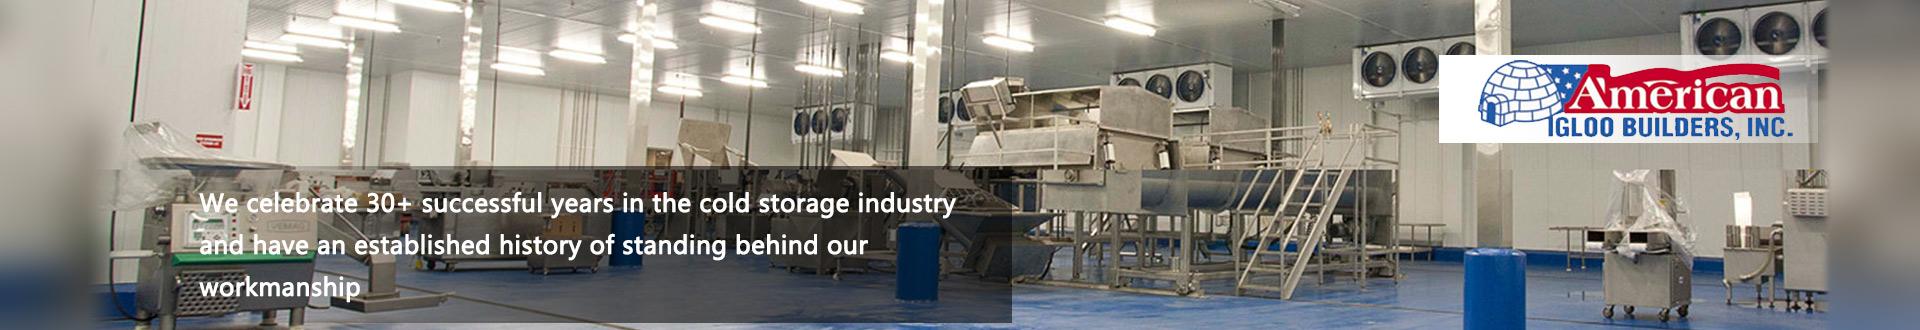 Cold Storage-American Igloo Builders Inc